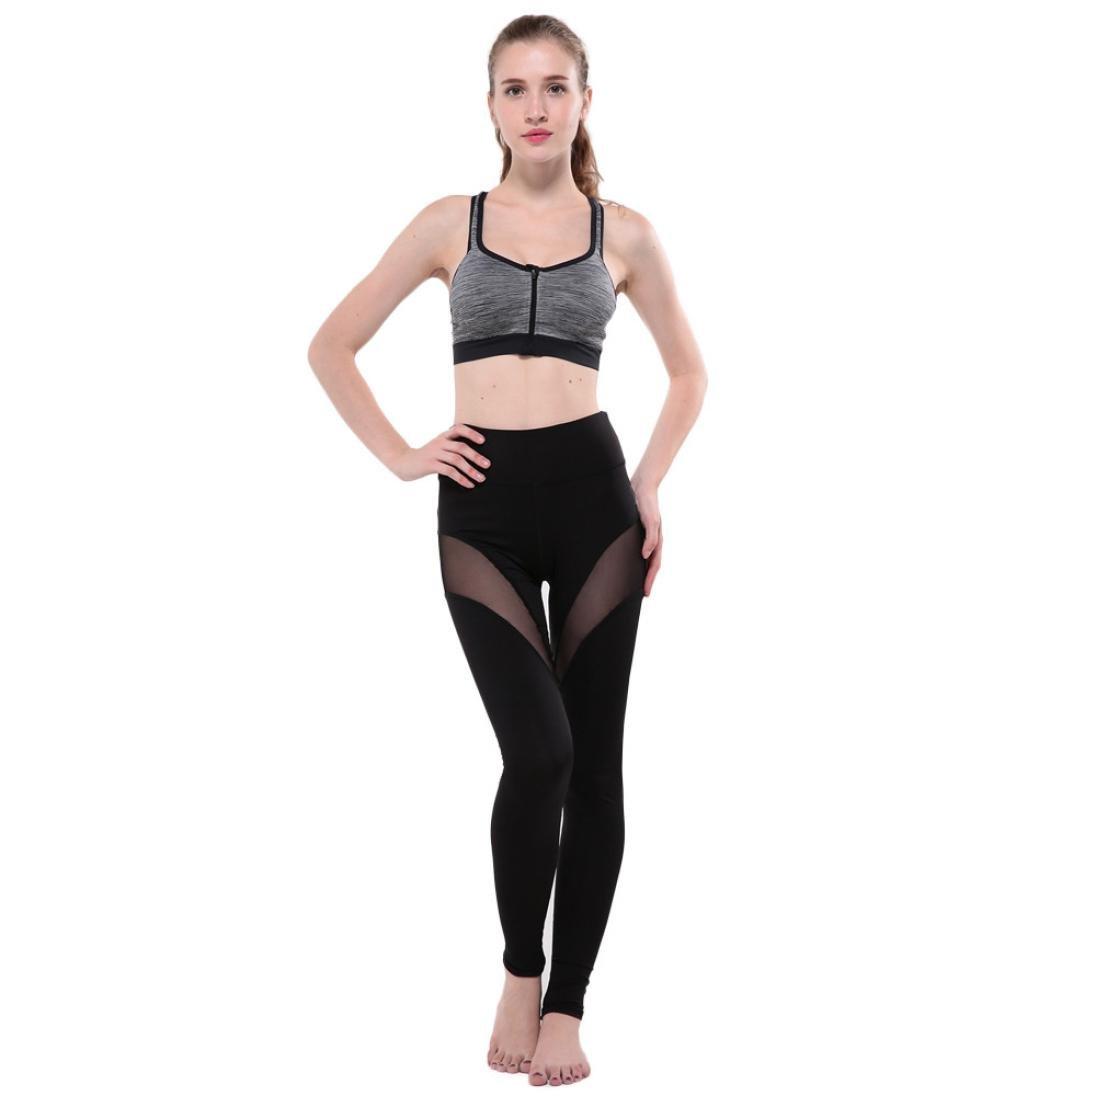 iTLOTL Women Fitness Leggings High Waist Mesh Patchwork Skinny Push up Pants Yoga Pants Black,XL